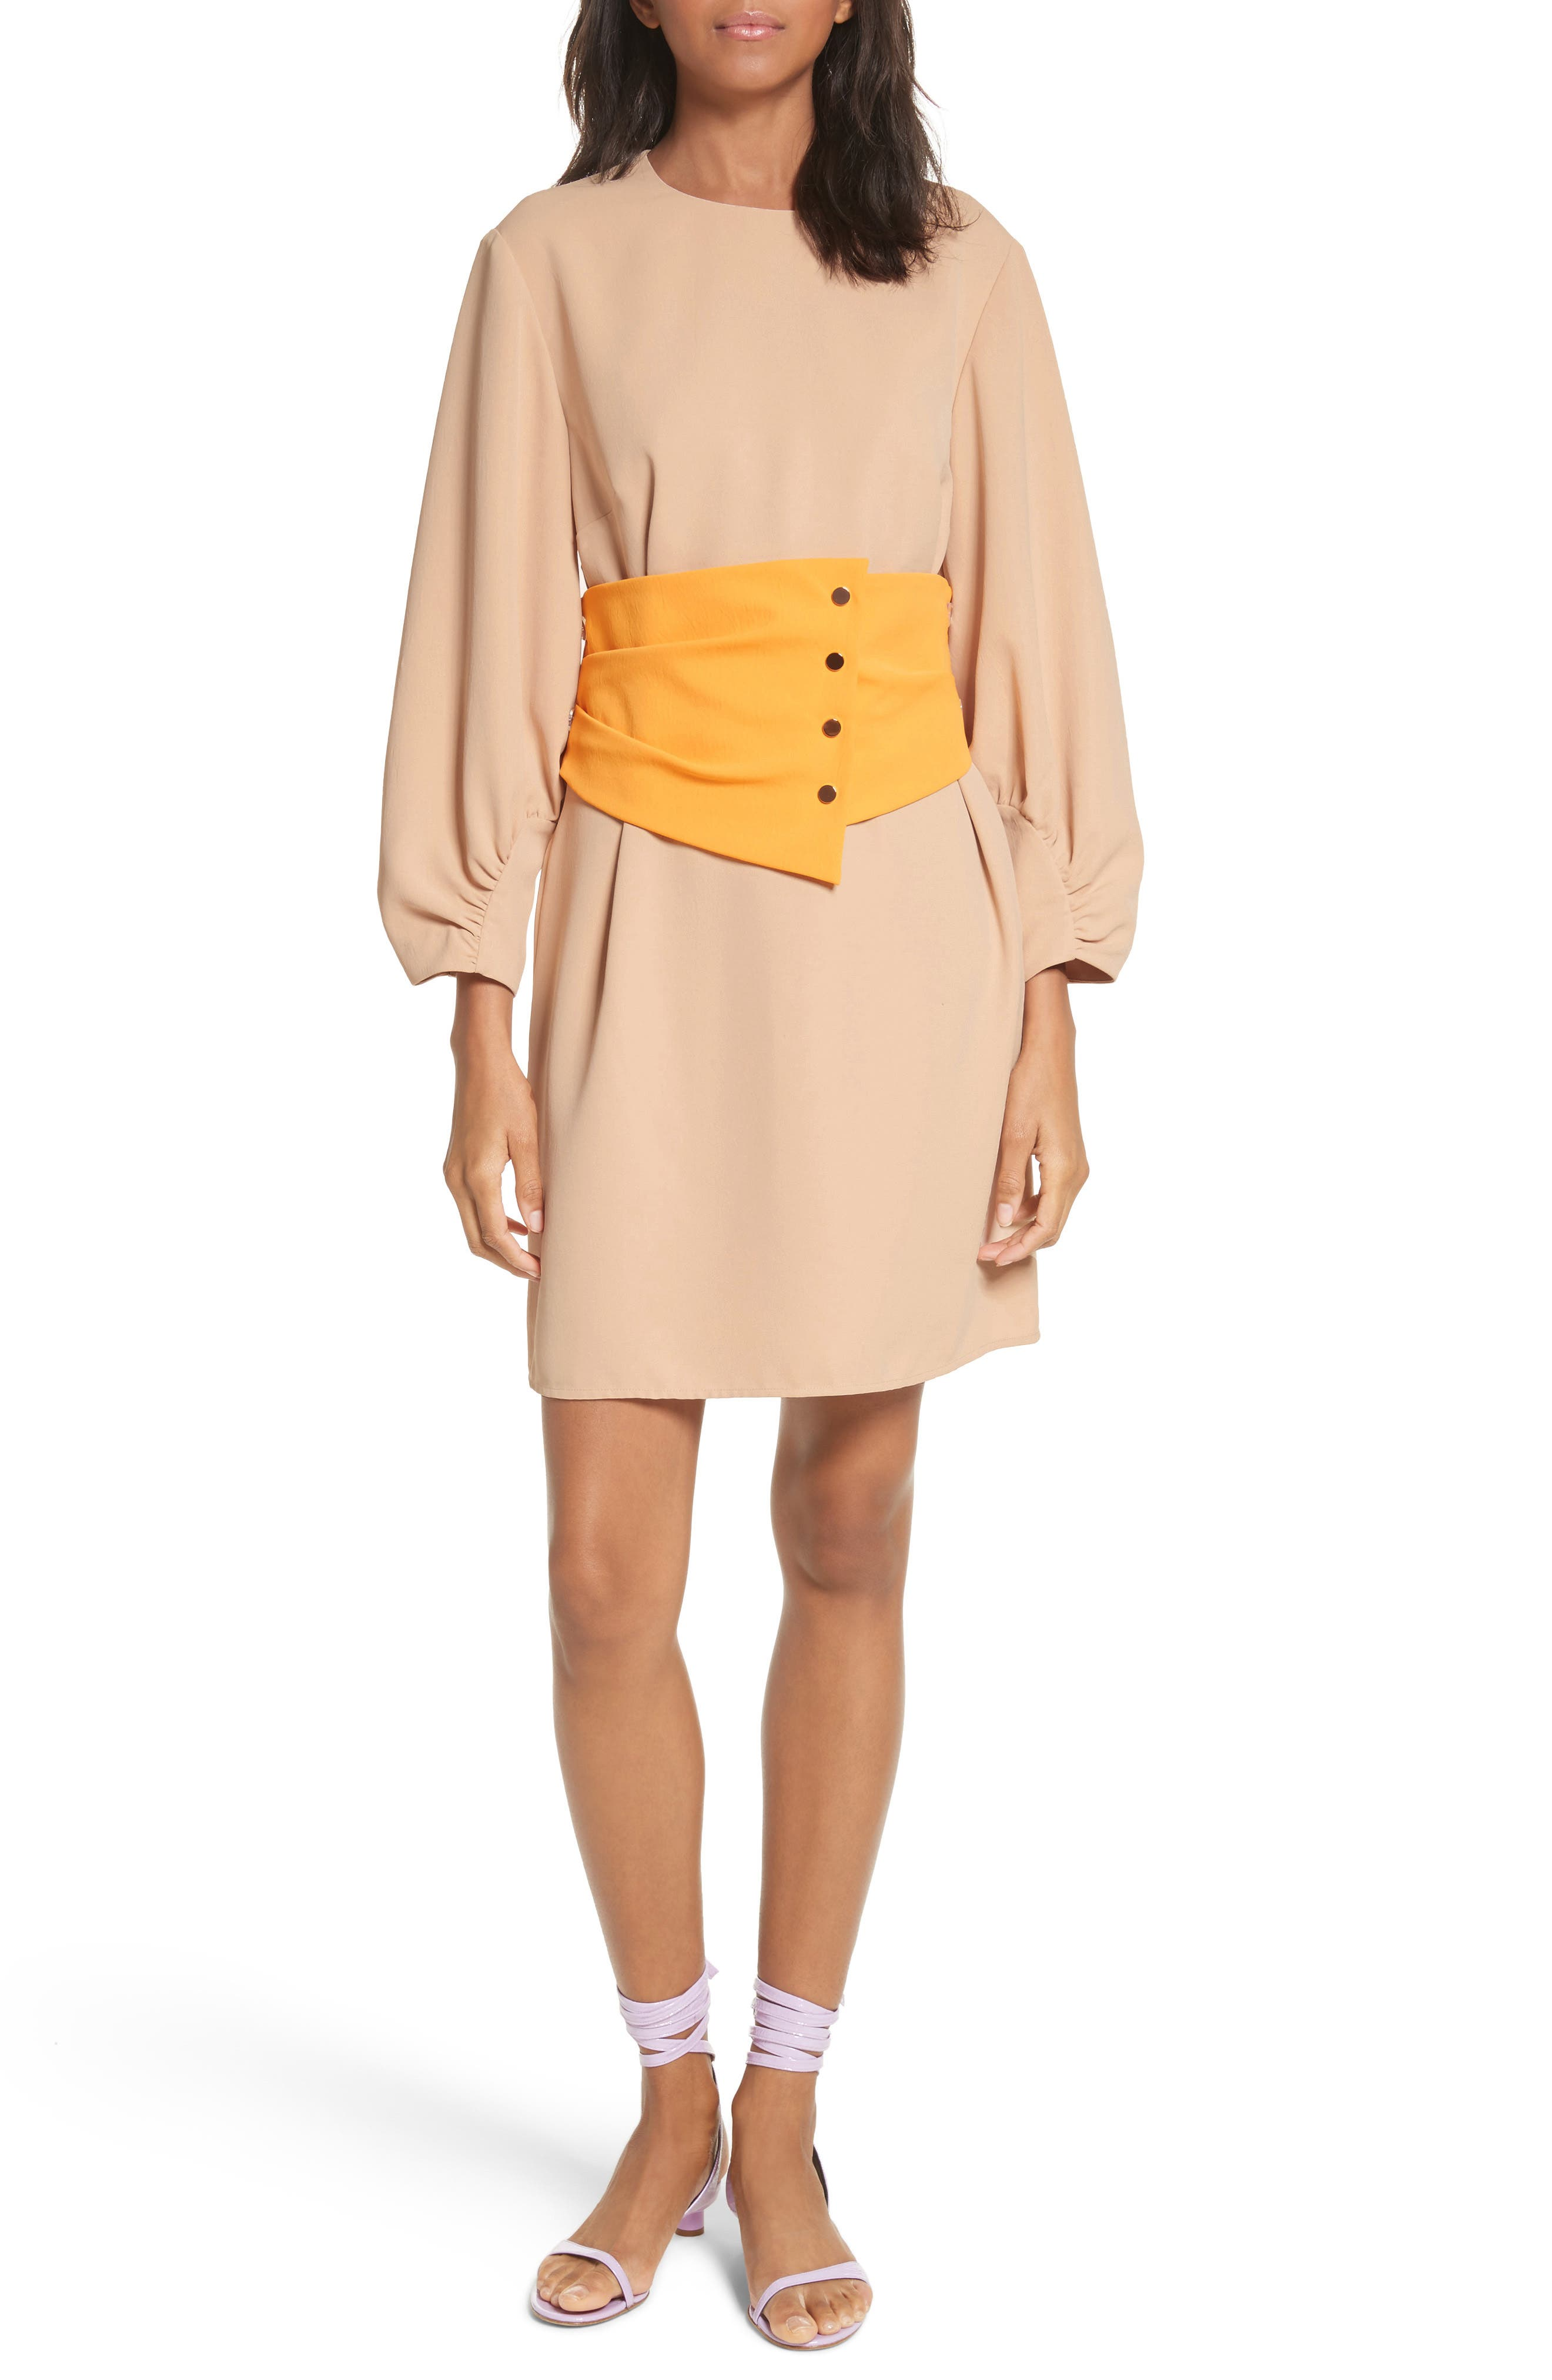 Shirred Sleeve Corset Dress,                             Main thumbnail 1, color,                             Nude/ Orange Multi